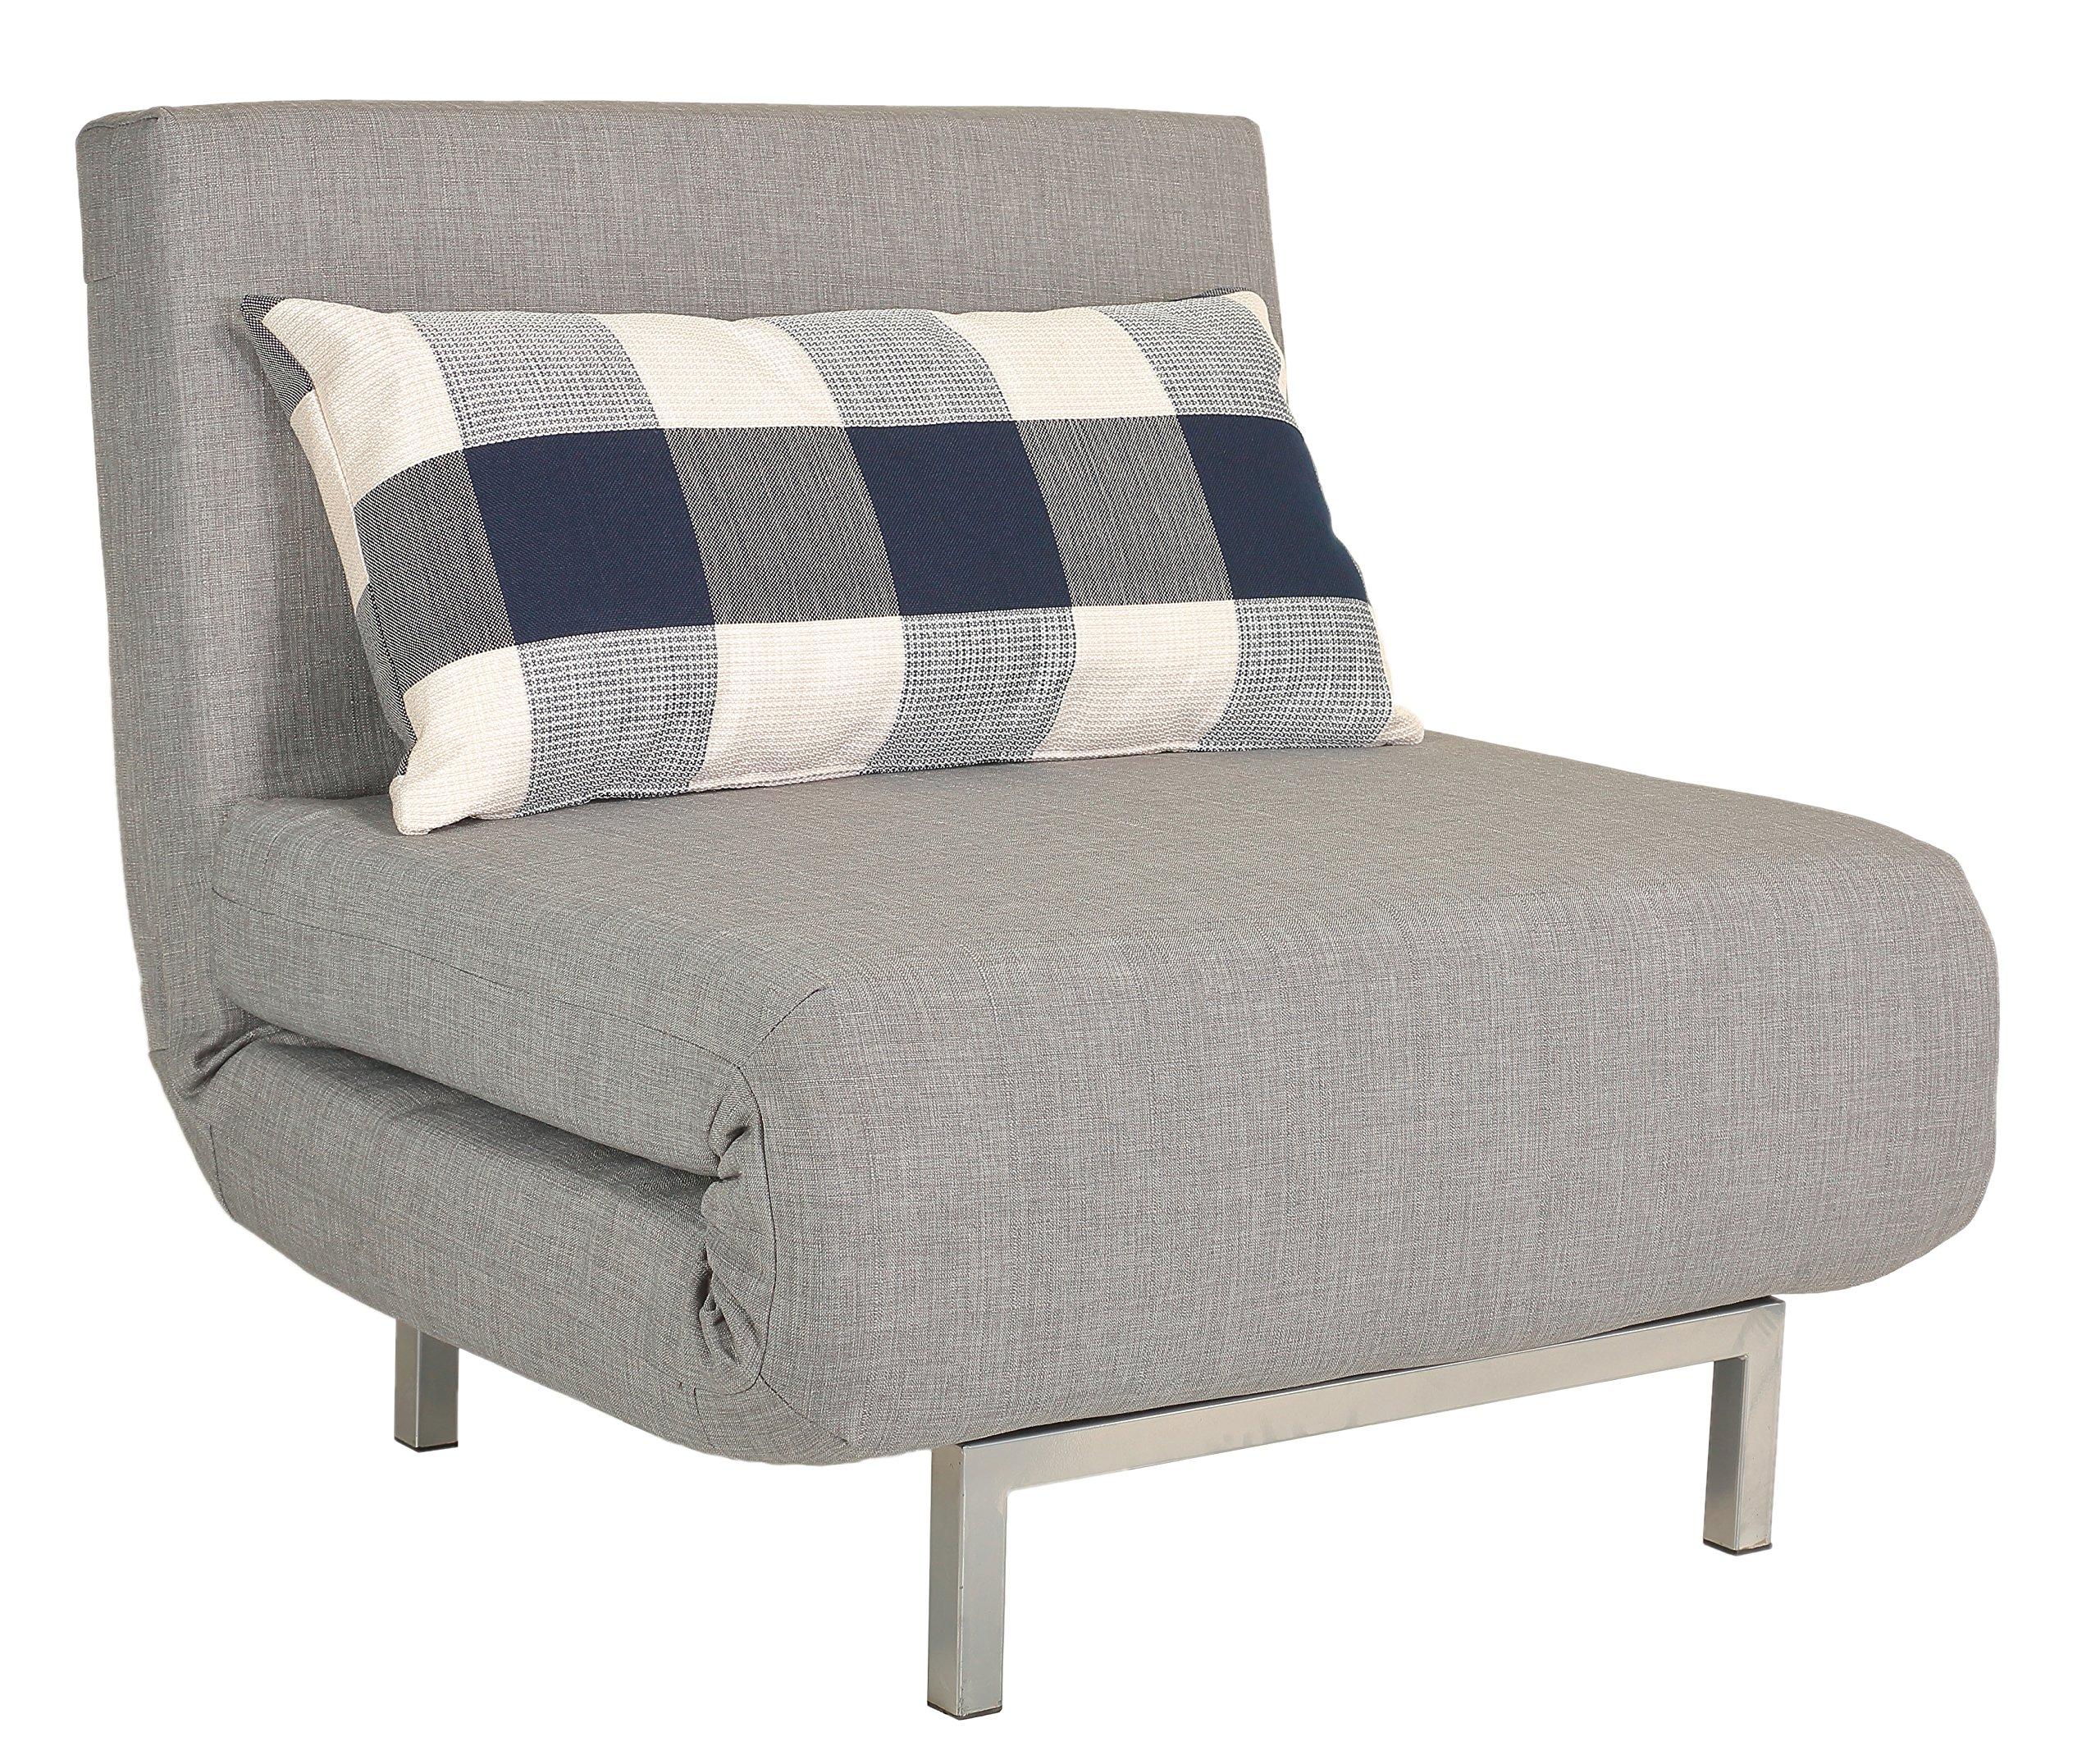 Cortesi Home Savion Convertible Accent Chair Bed, Grey